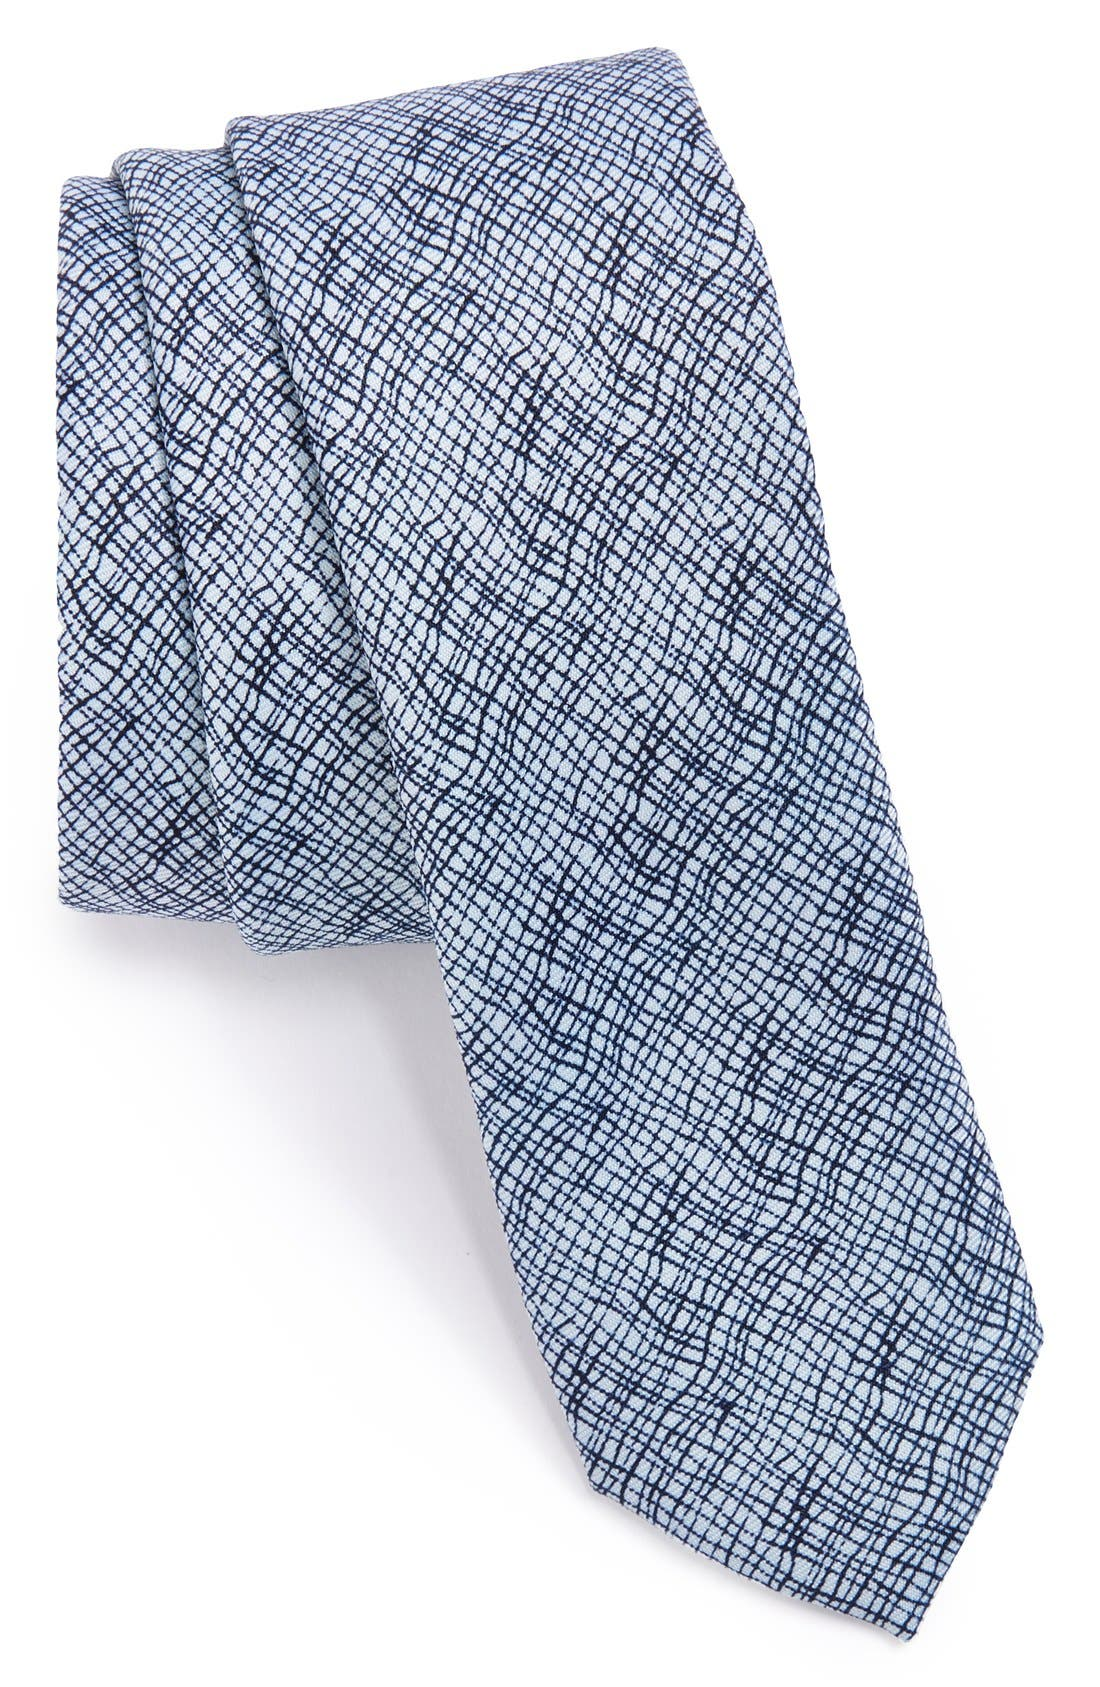 Alternate Image 1 Selected - Topman Crosshatch Pattern Tie